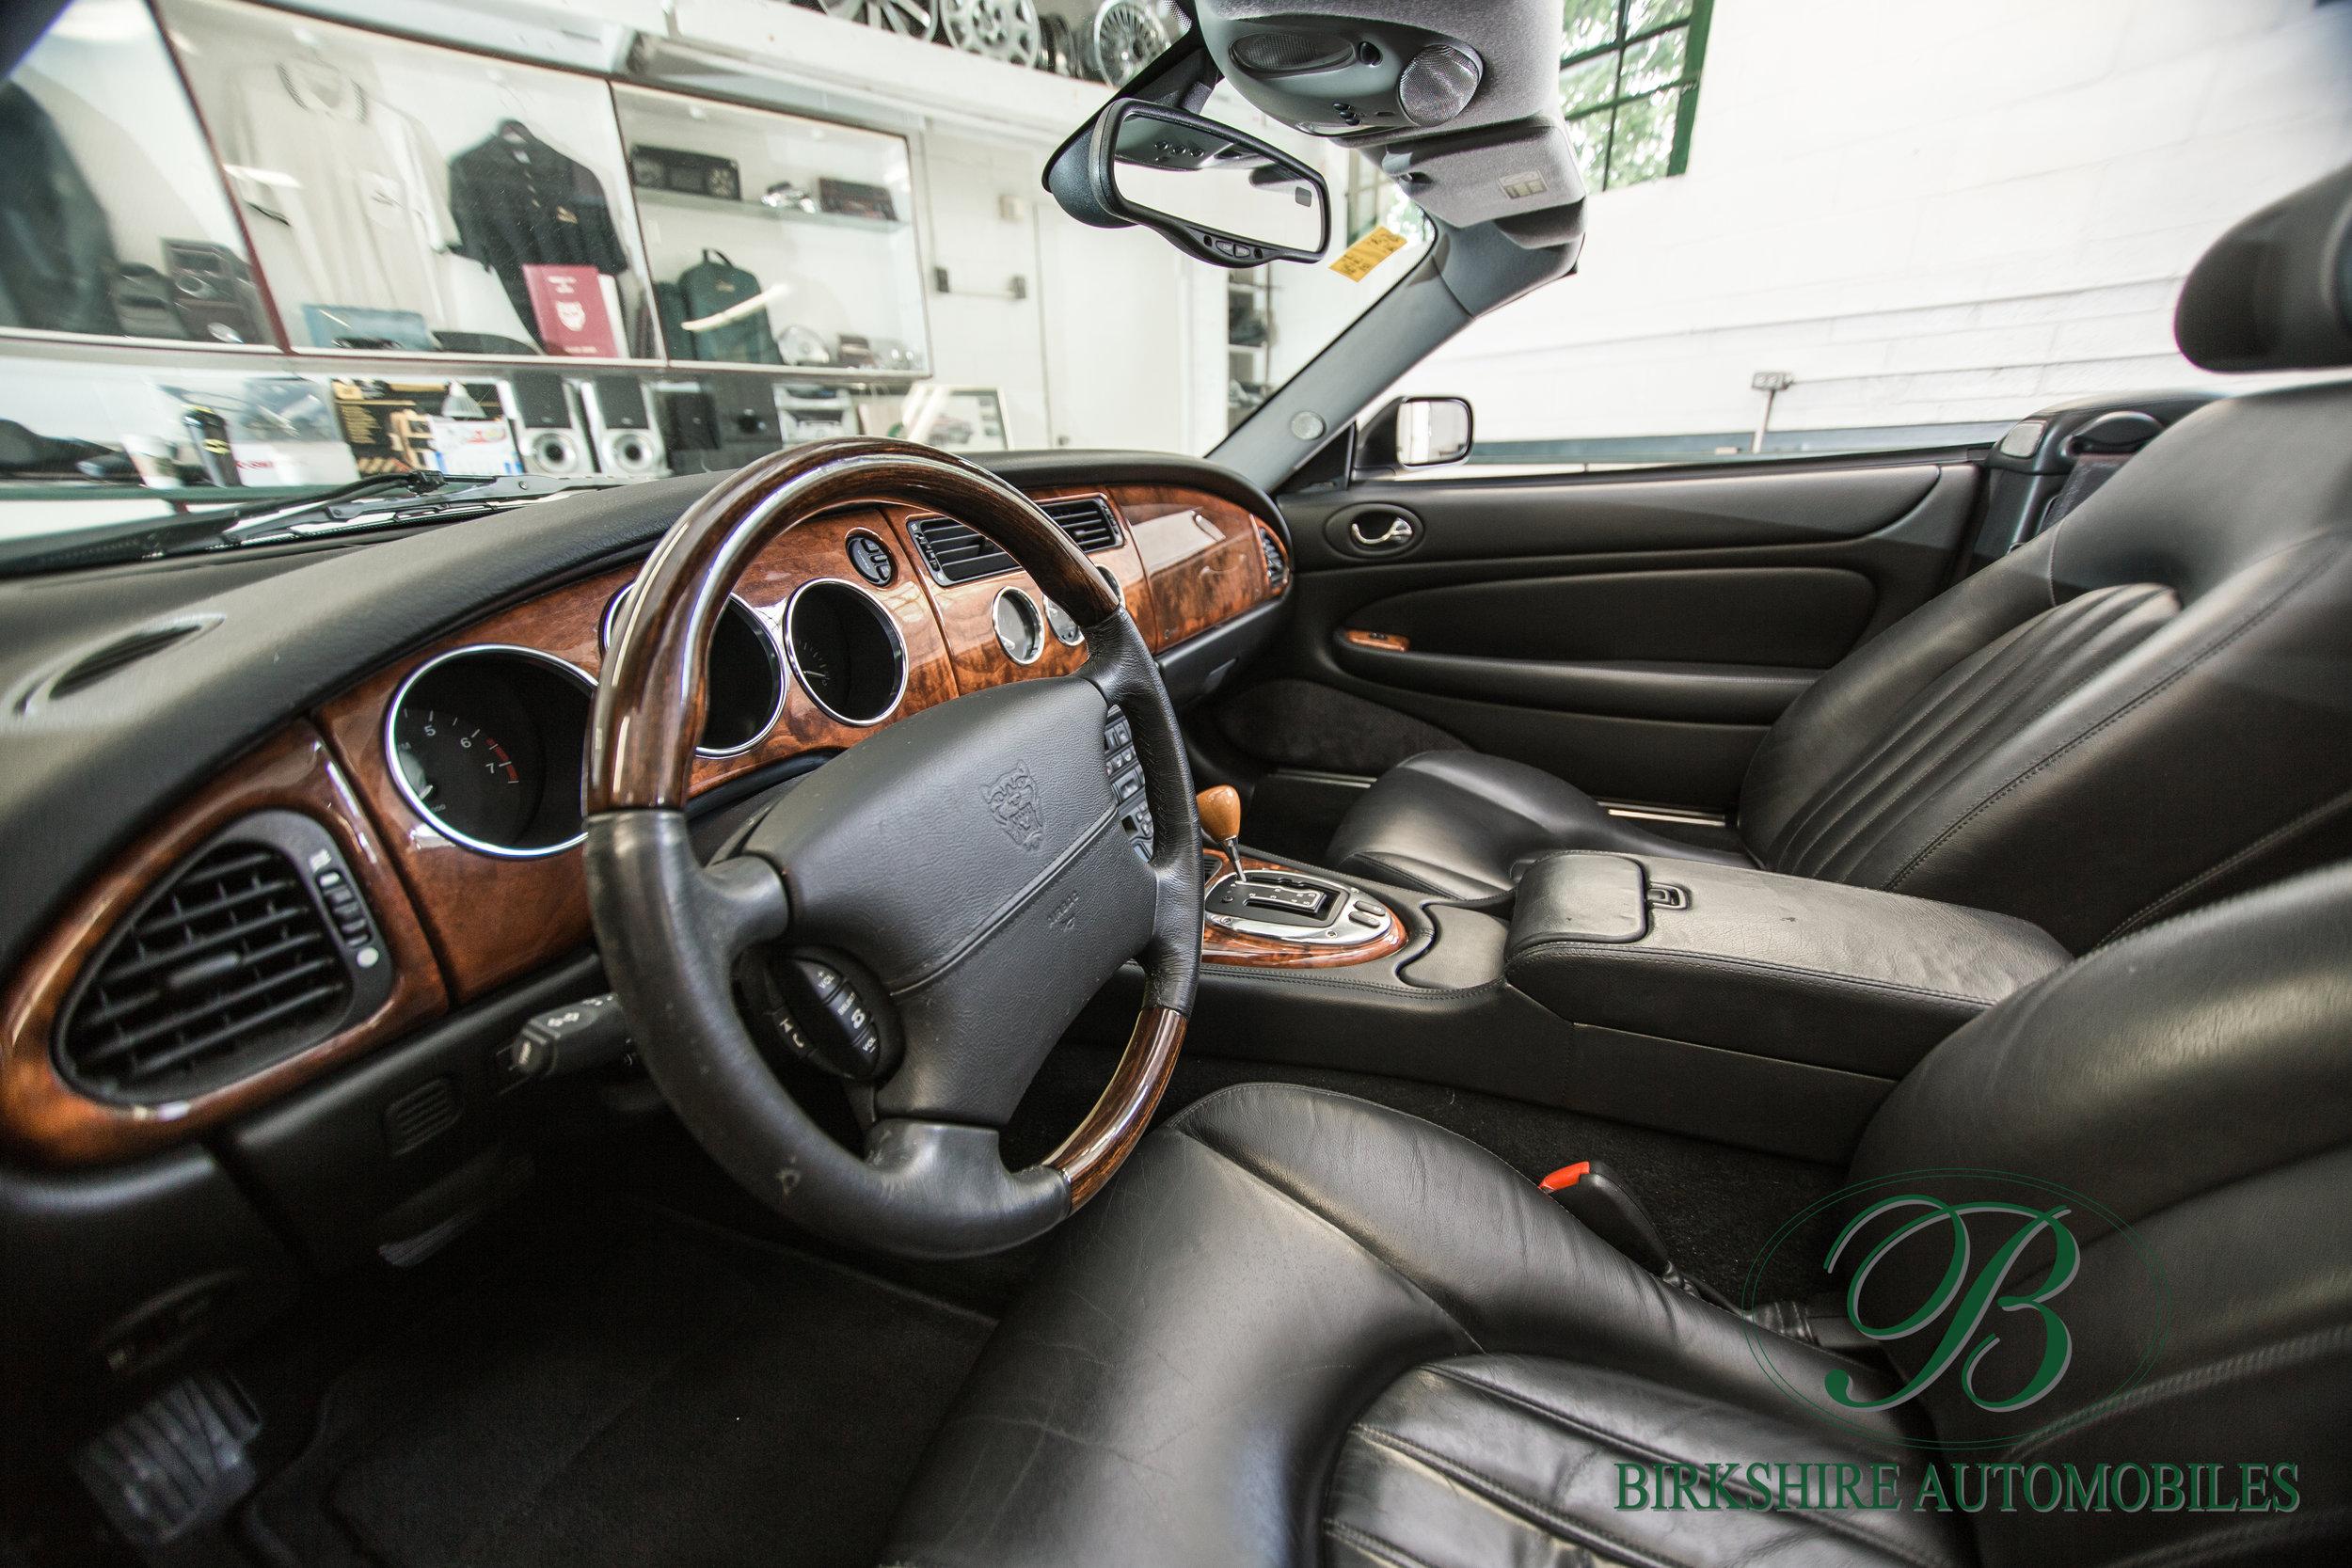 Birkshire Automobiles-242.jpg